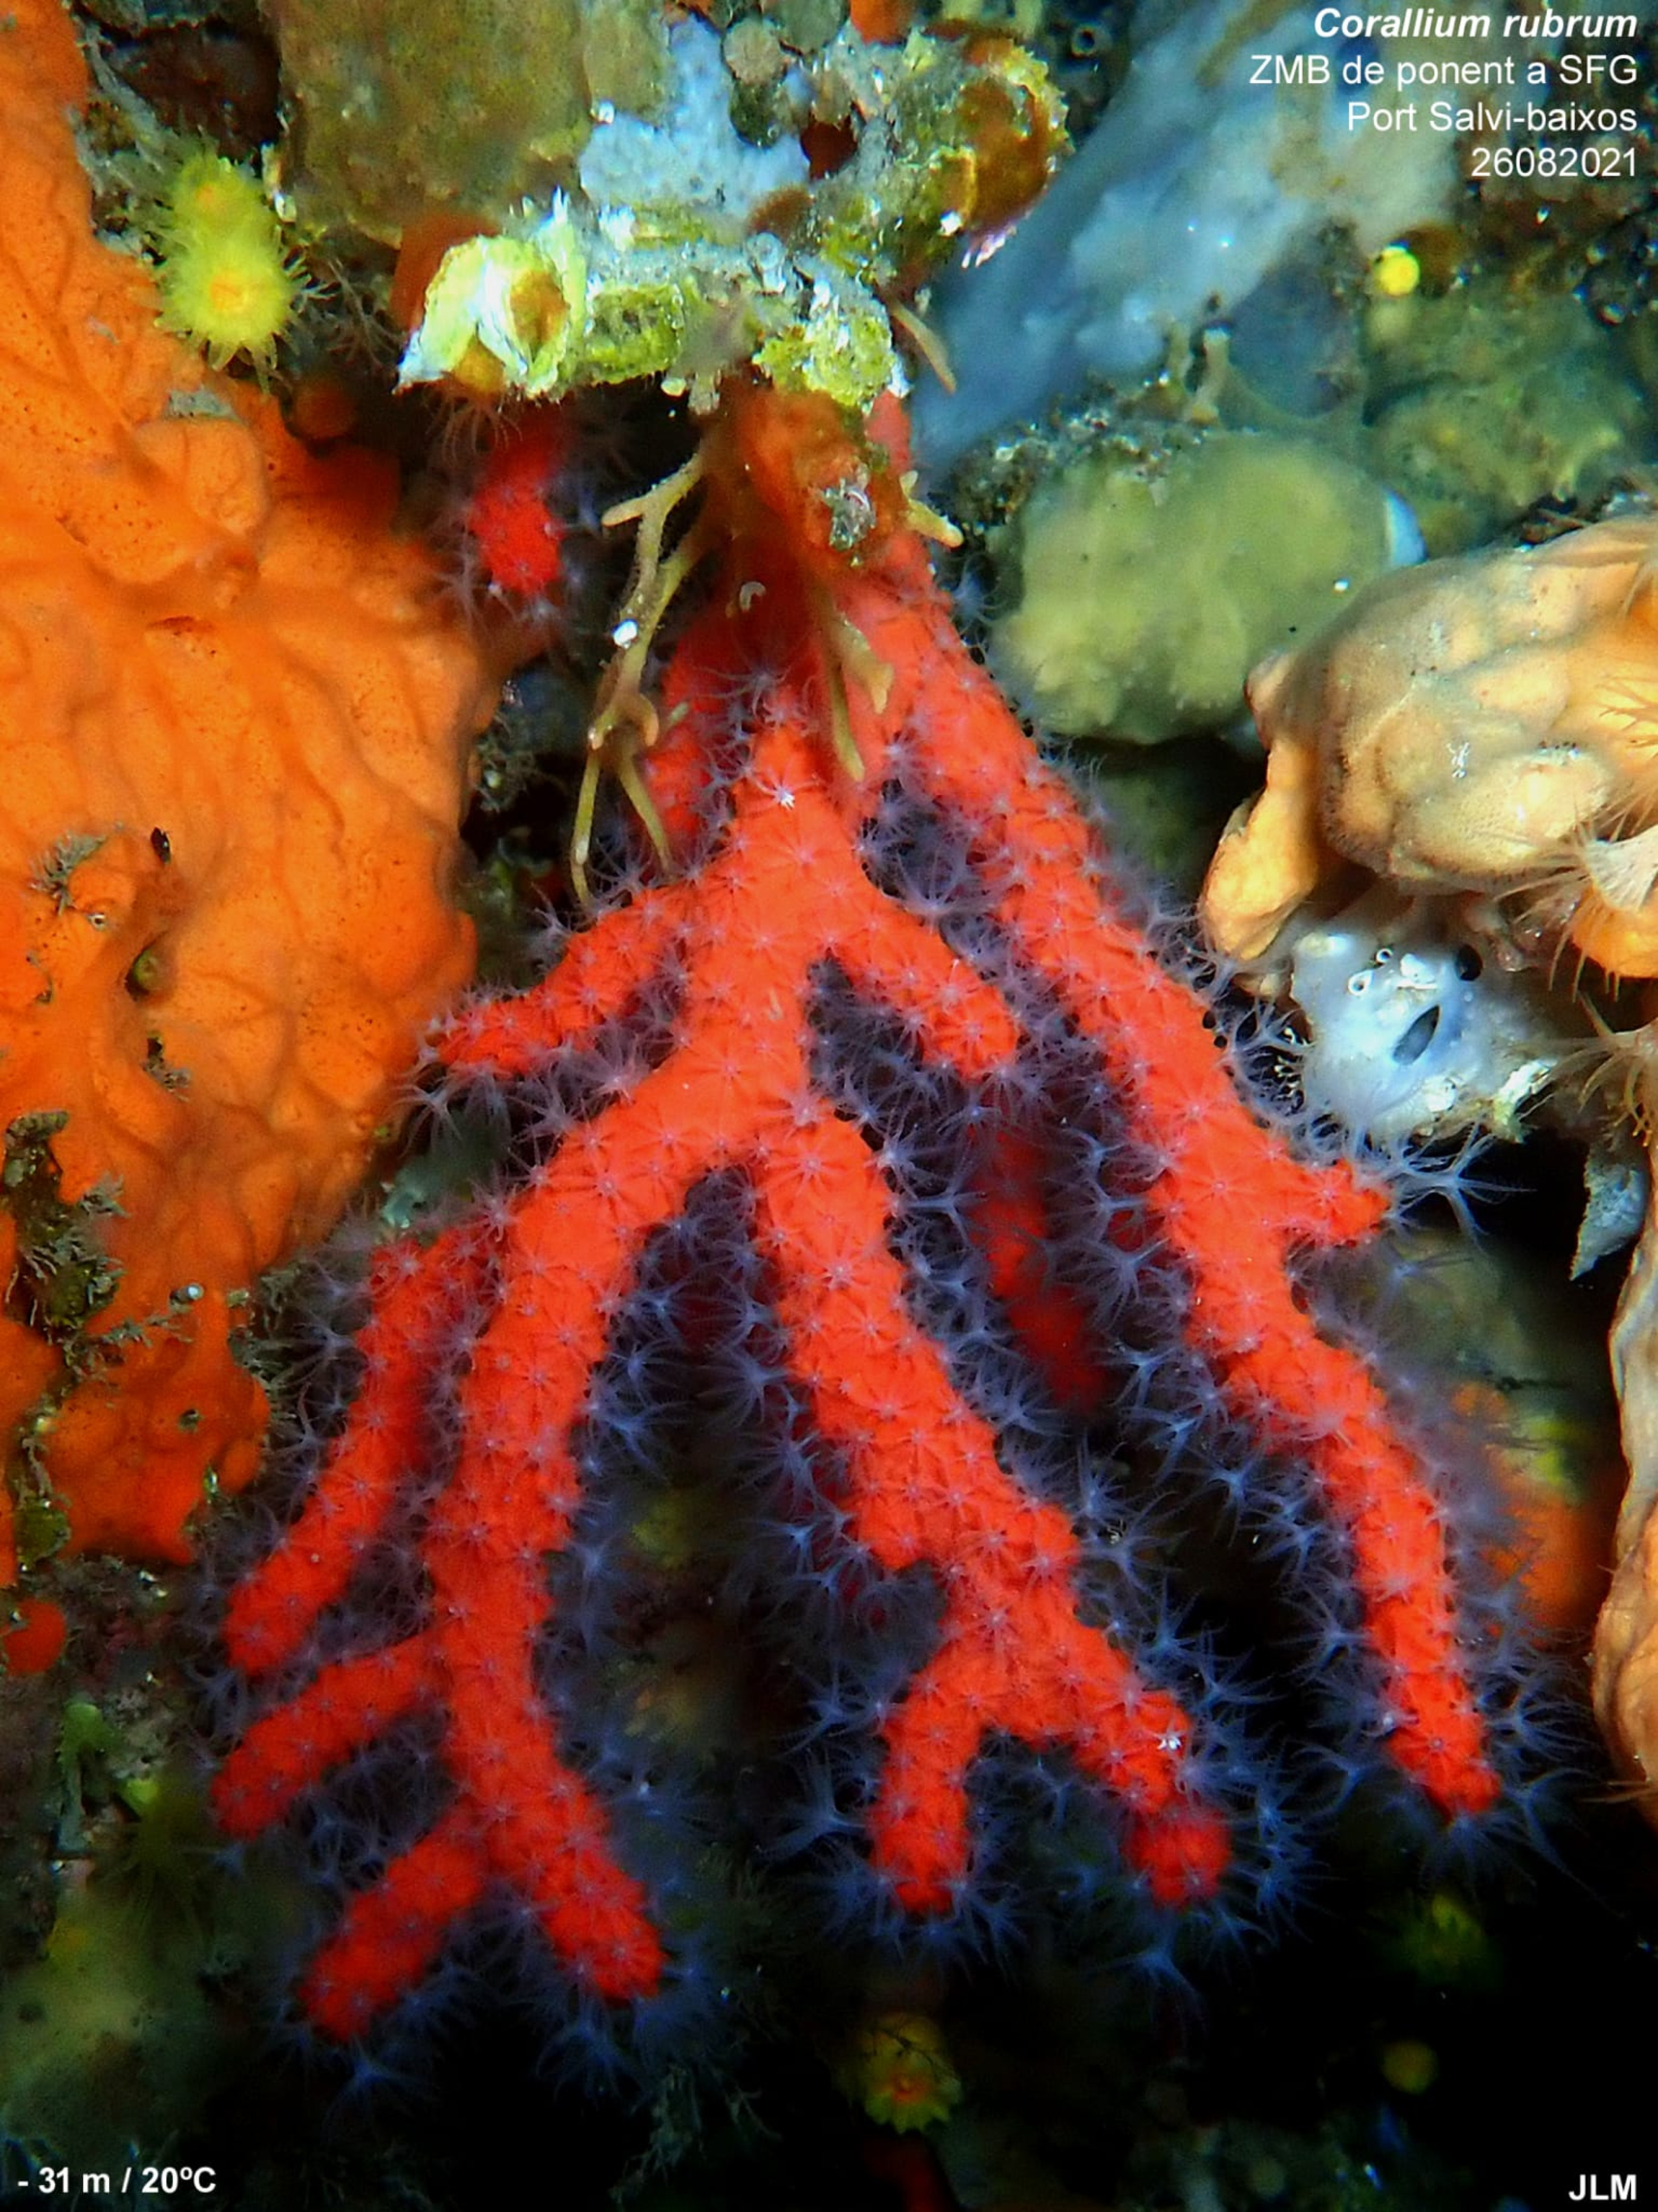 La branca de corall vermell desapareguda a Sant Feliu de Guíxols | ACN